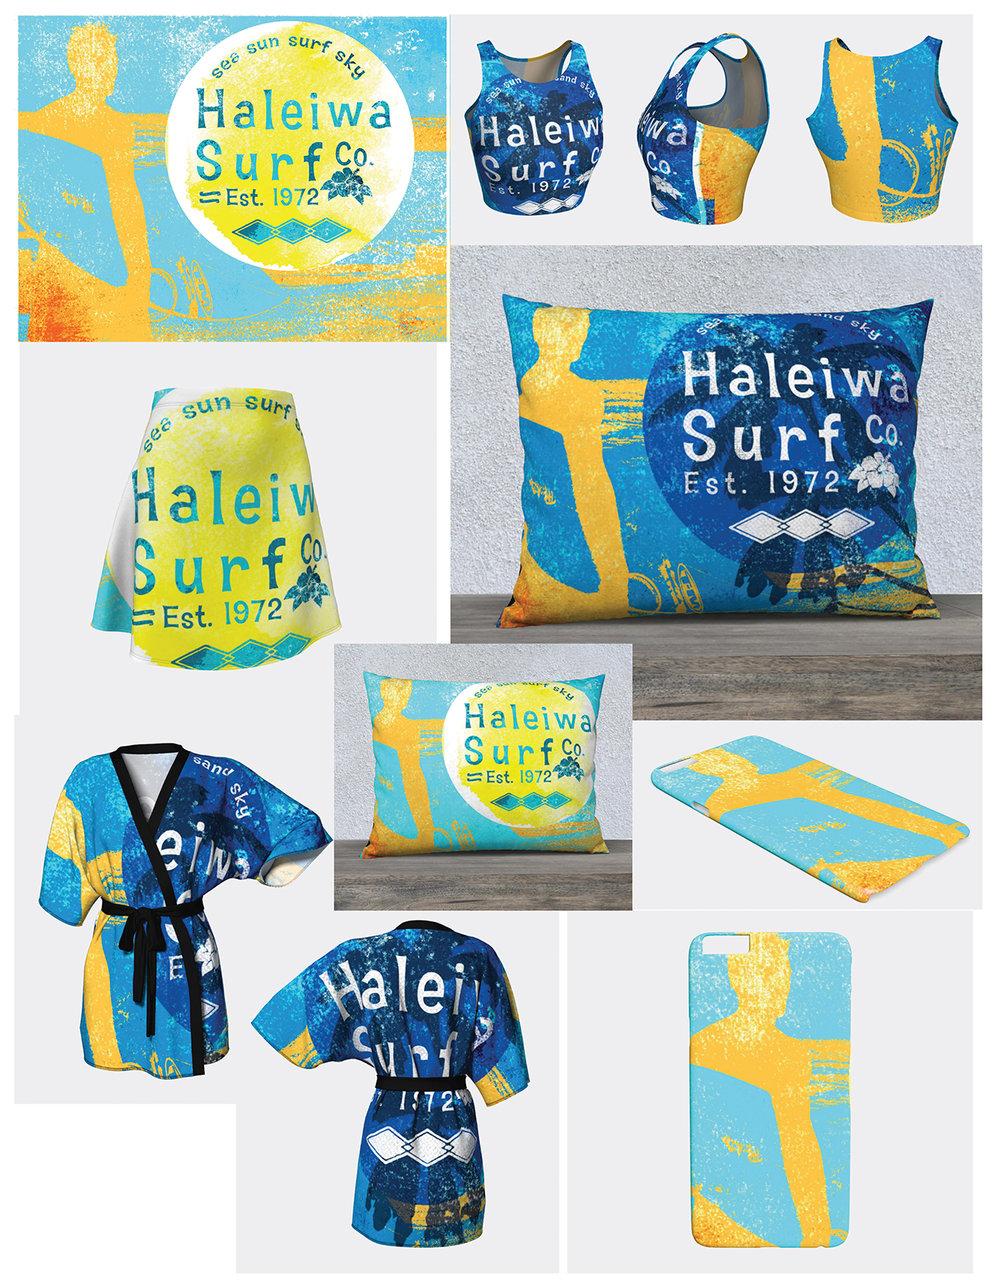 Haliewa Surf Co. Sample Products